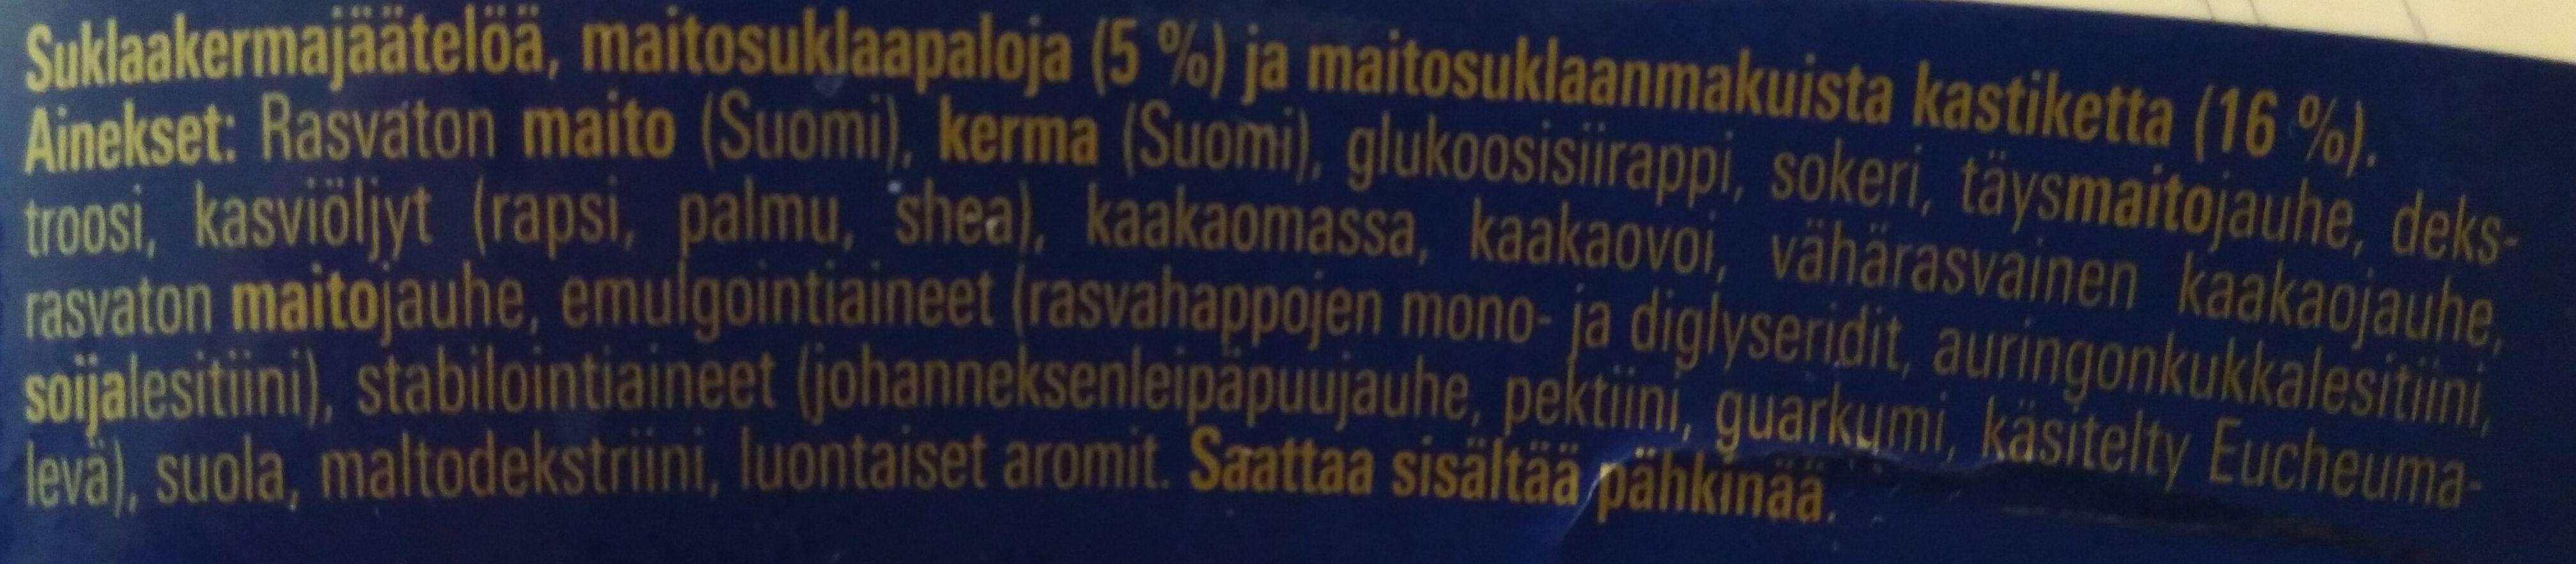 Premium Maitosuklaa - Ingredients - fi